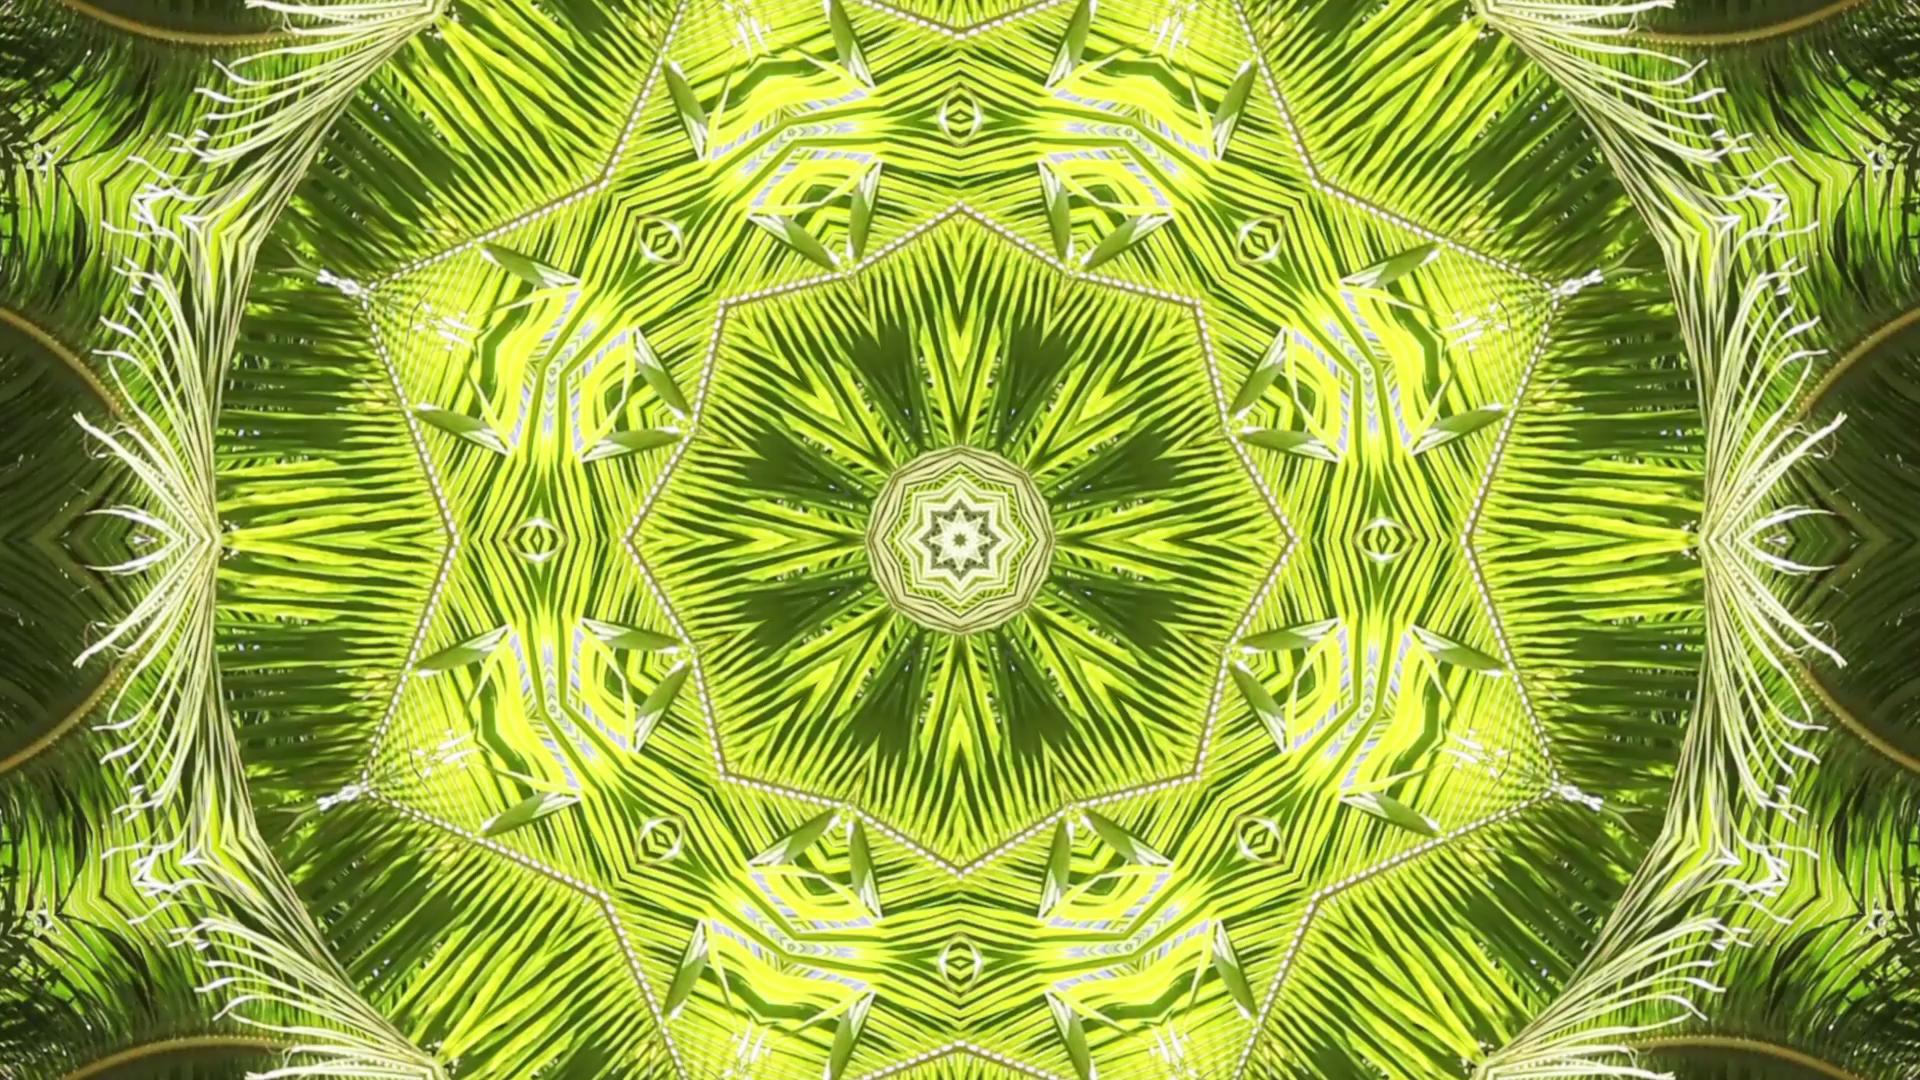 Anne Spalter  Bora Bora: Palm Fronds, 1080p HD digital video, 3 min. 2013